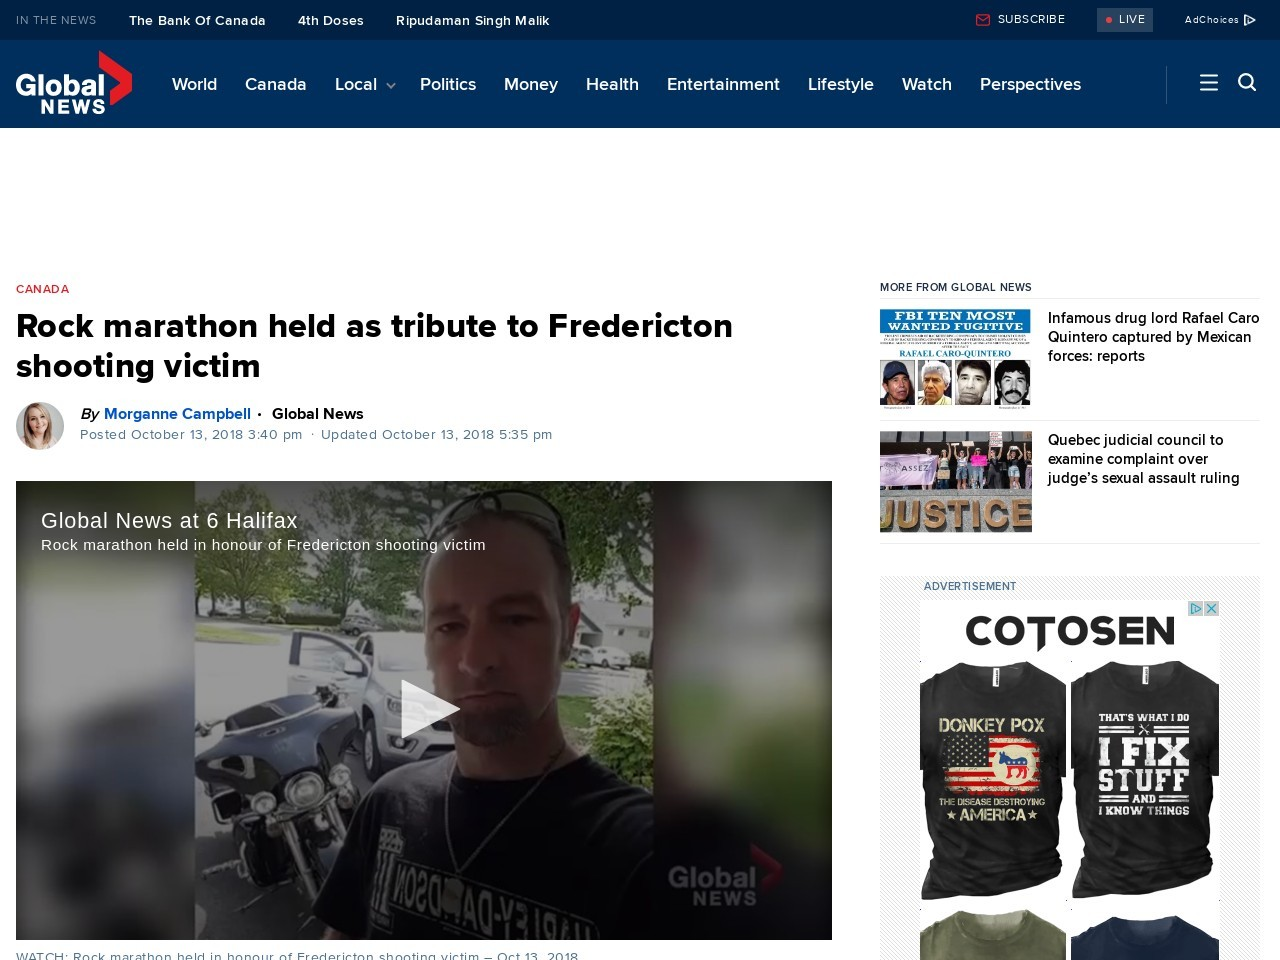 Rock marathon held as tribute to Fredericton shooting victim